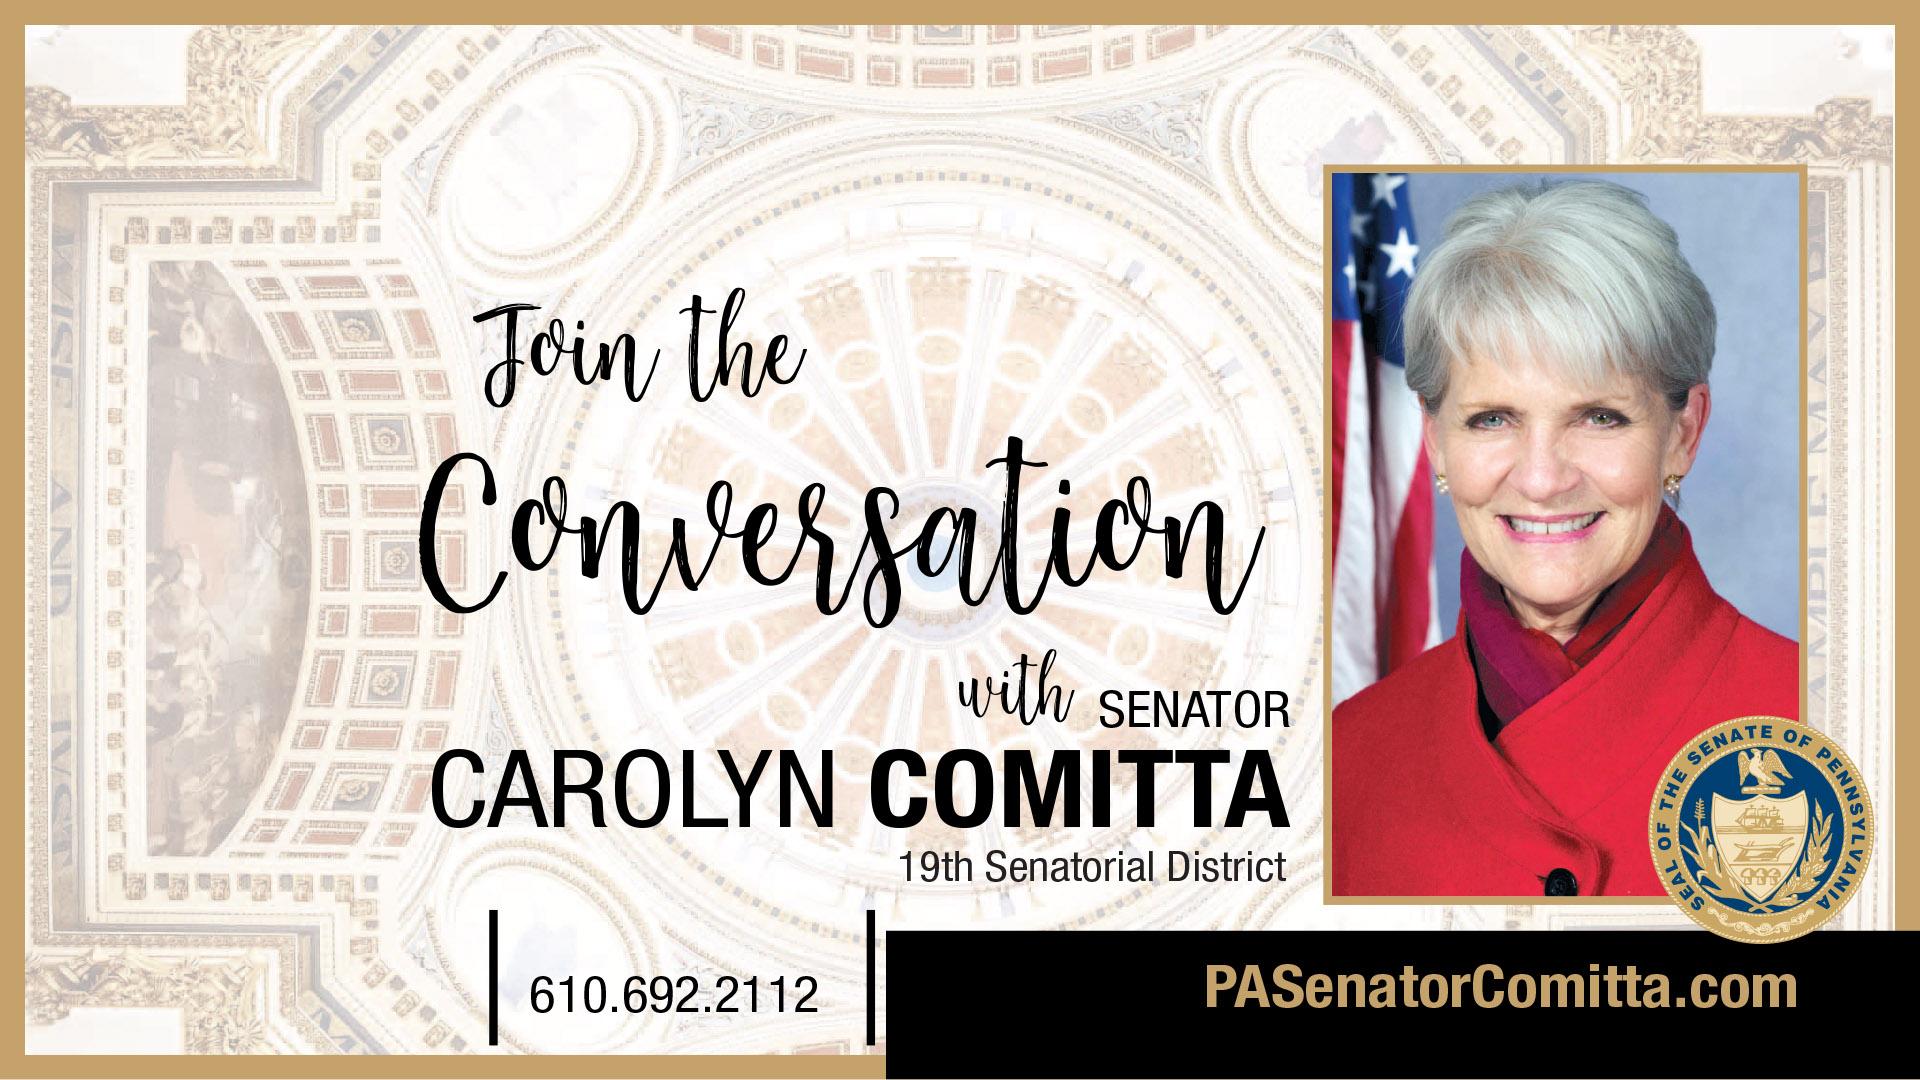 PA State Senator Carolyn Comitta